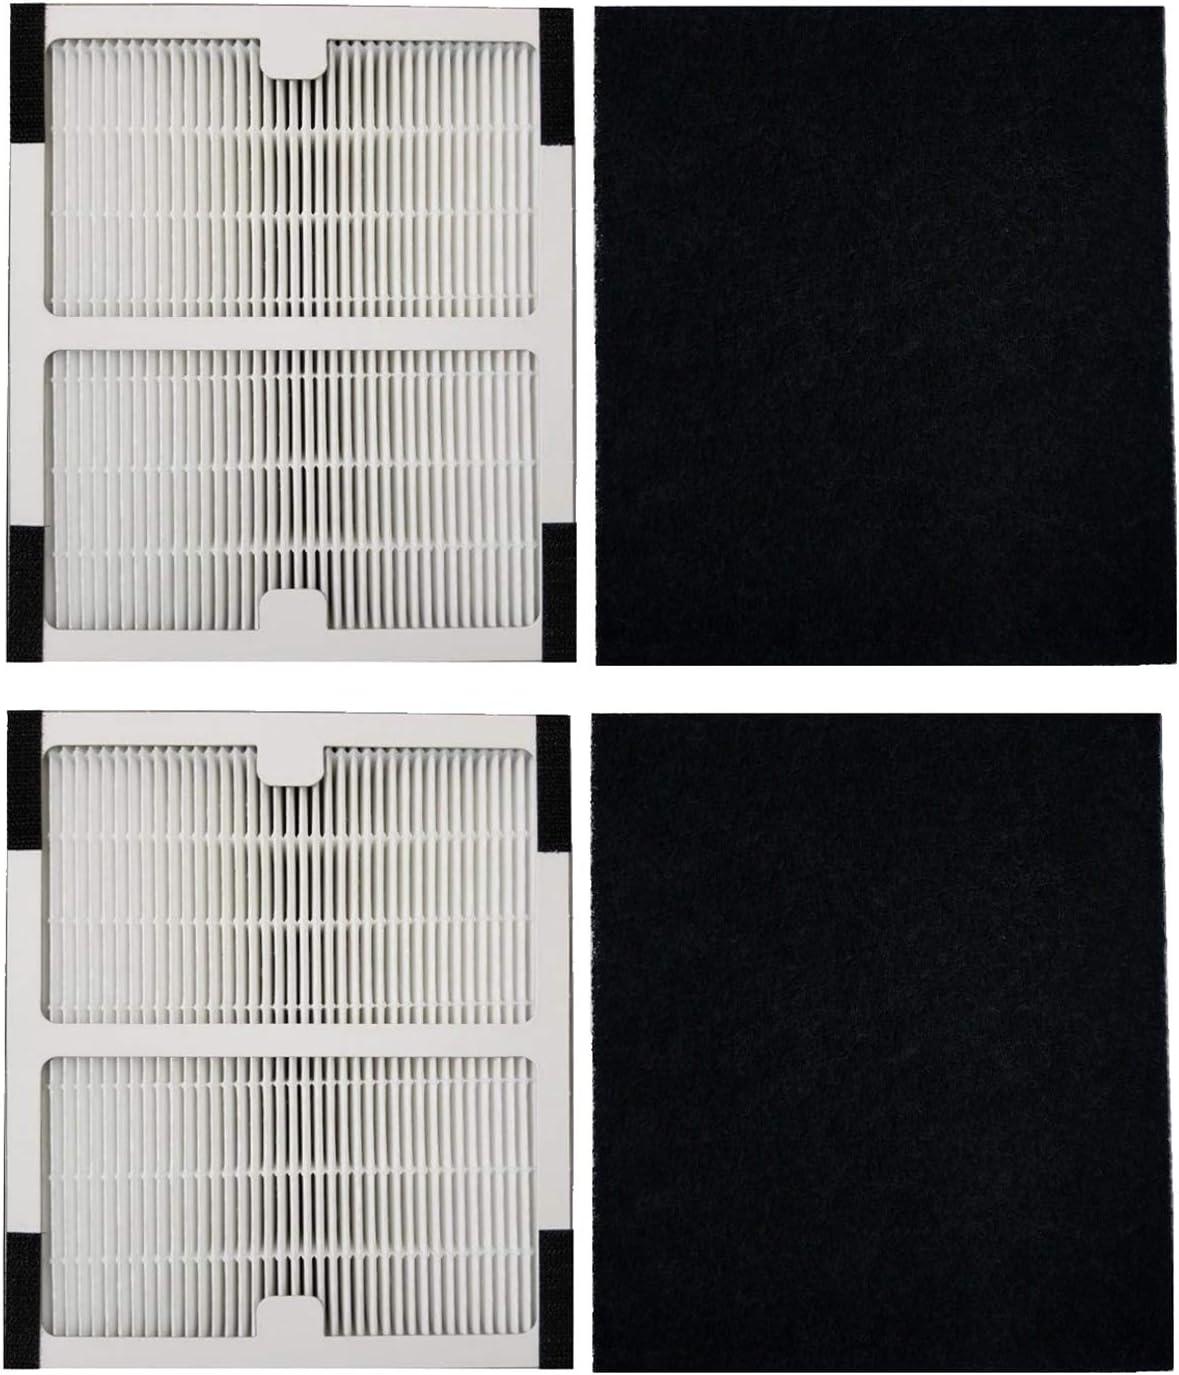 2 Replacements Idylis D IAP-10-280 HEPA Air Purifier Filters Part # IAF-H-100D